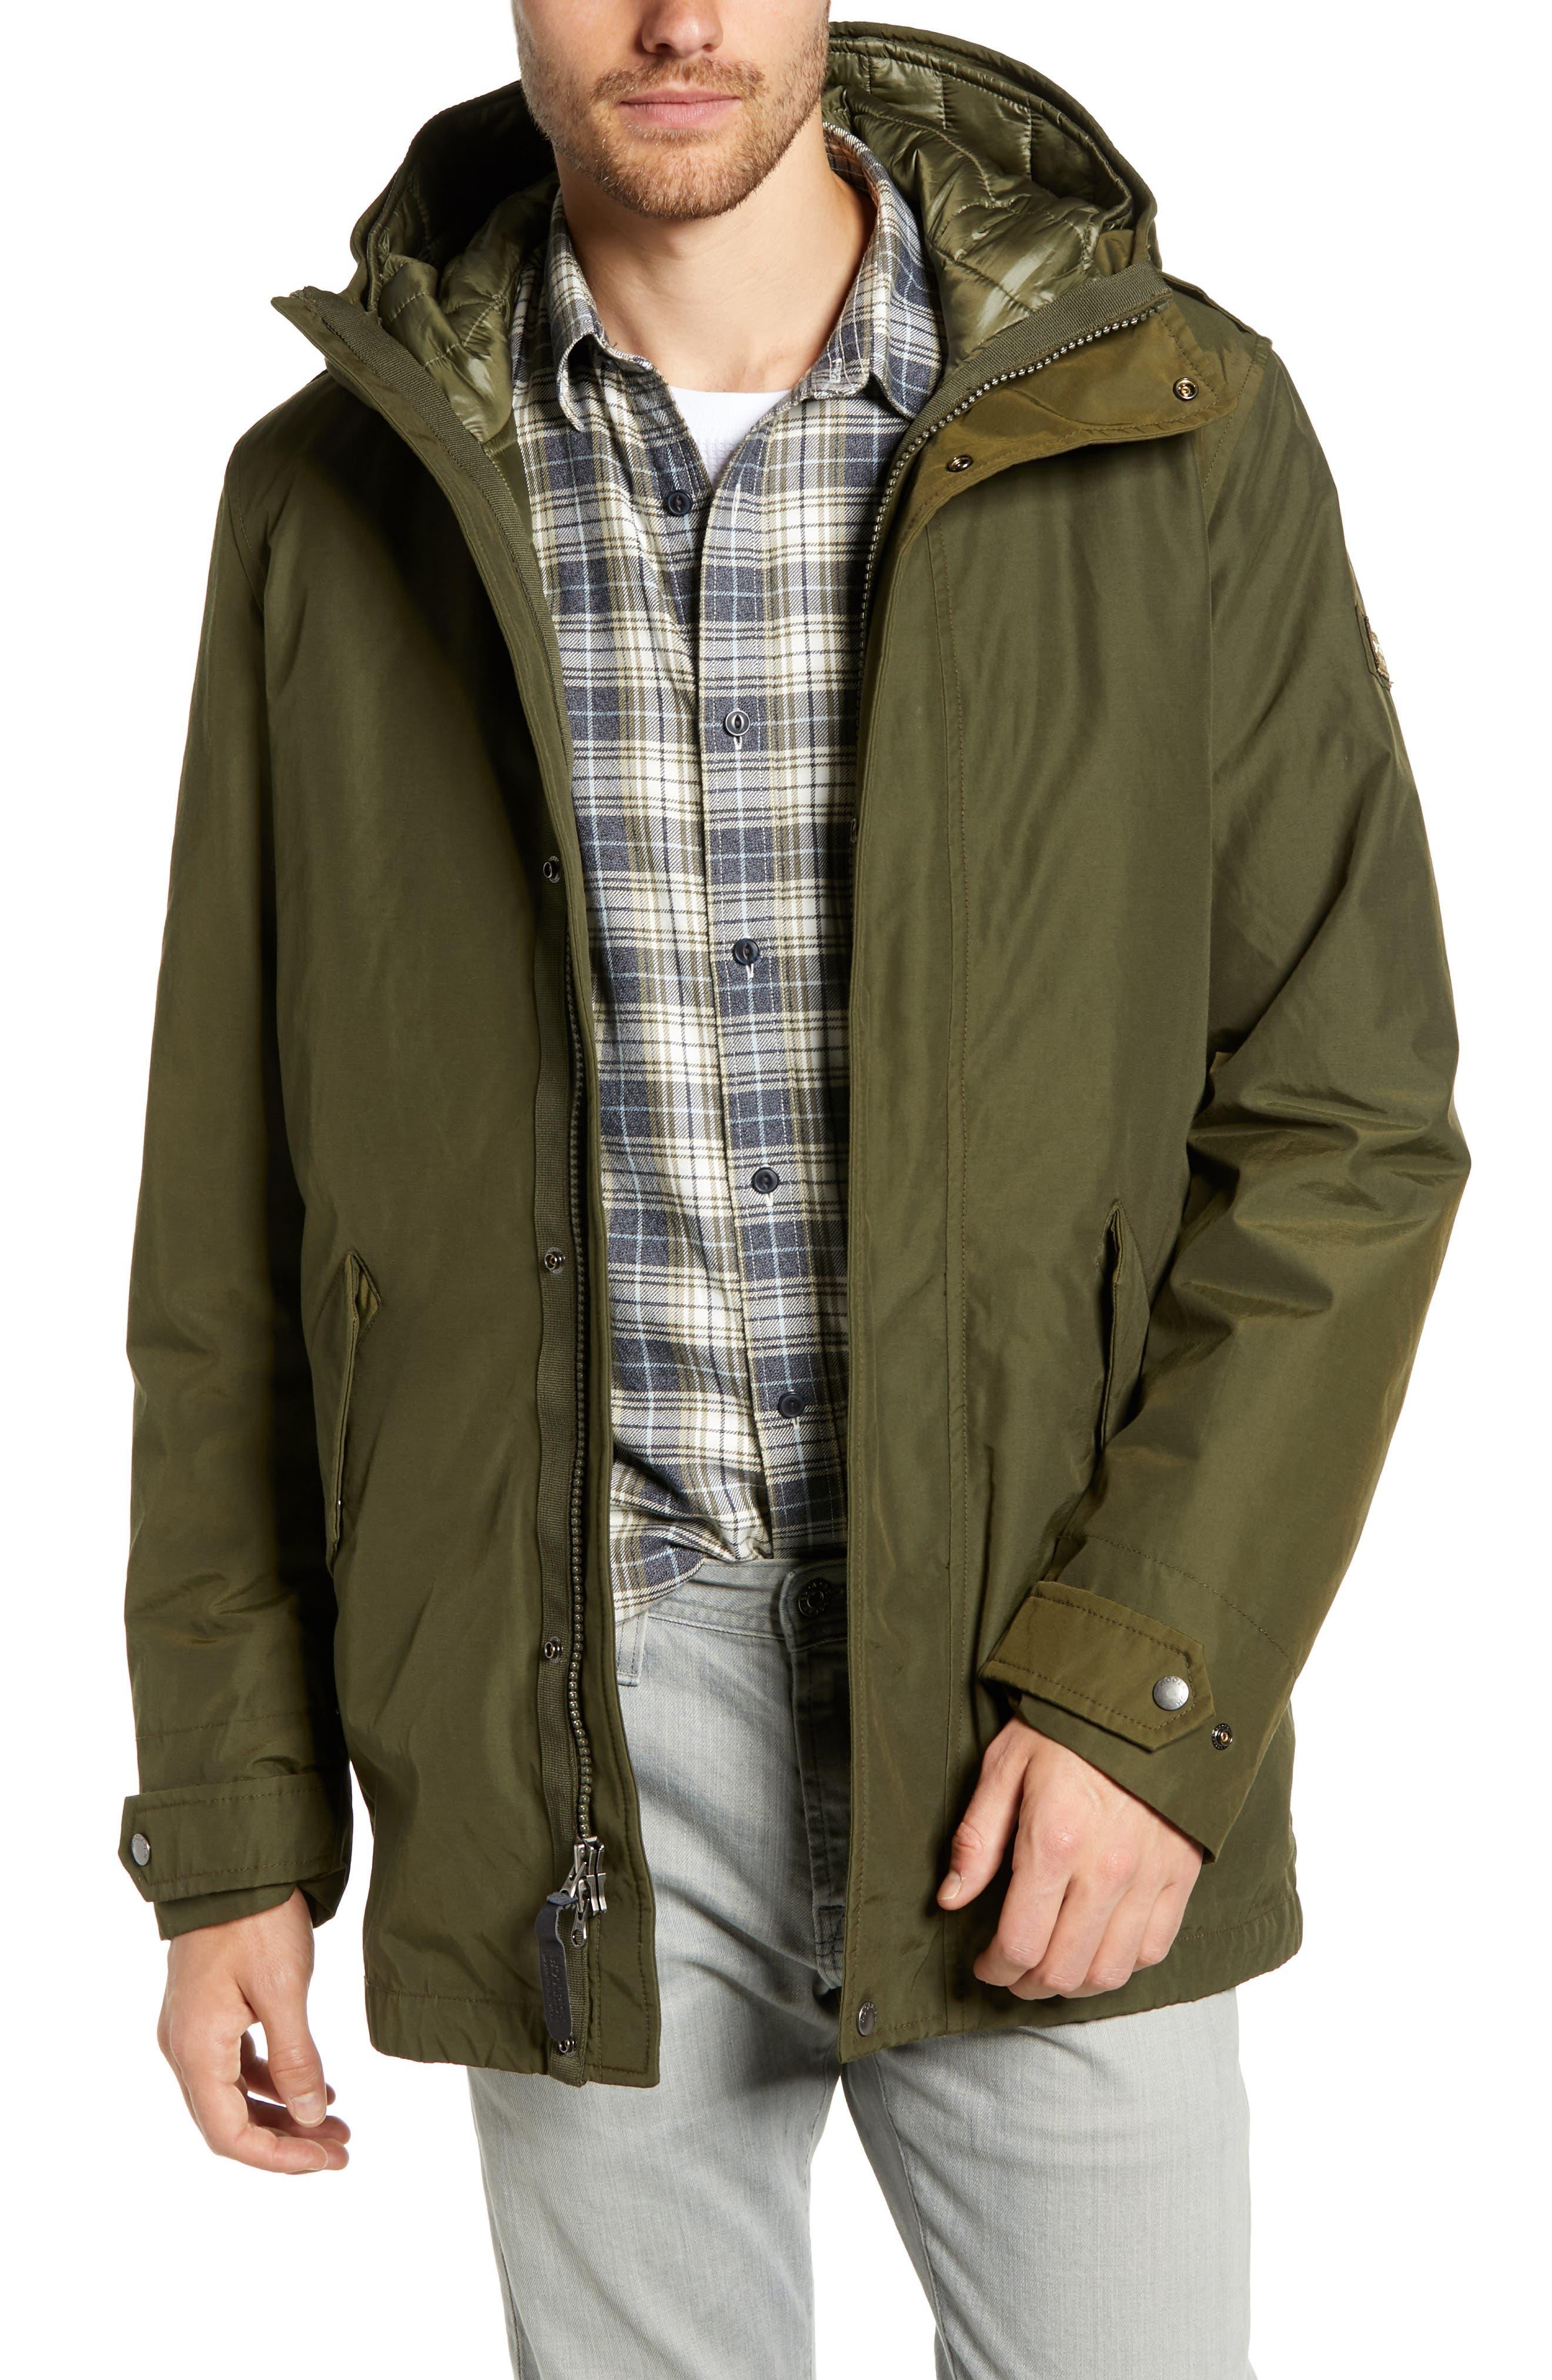 John Rich 'Long Military Eskimo' 3-in-1 Hooded Jacket,                             Main thumbnail 1, color,                             FLINT OLIVE